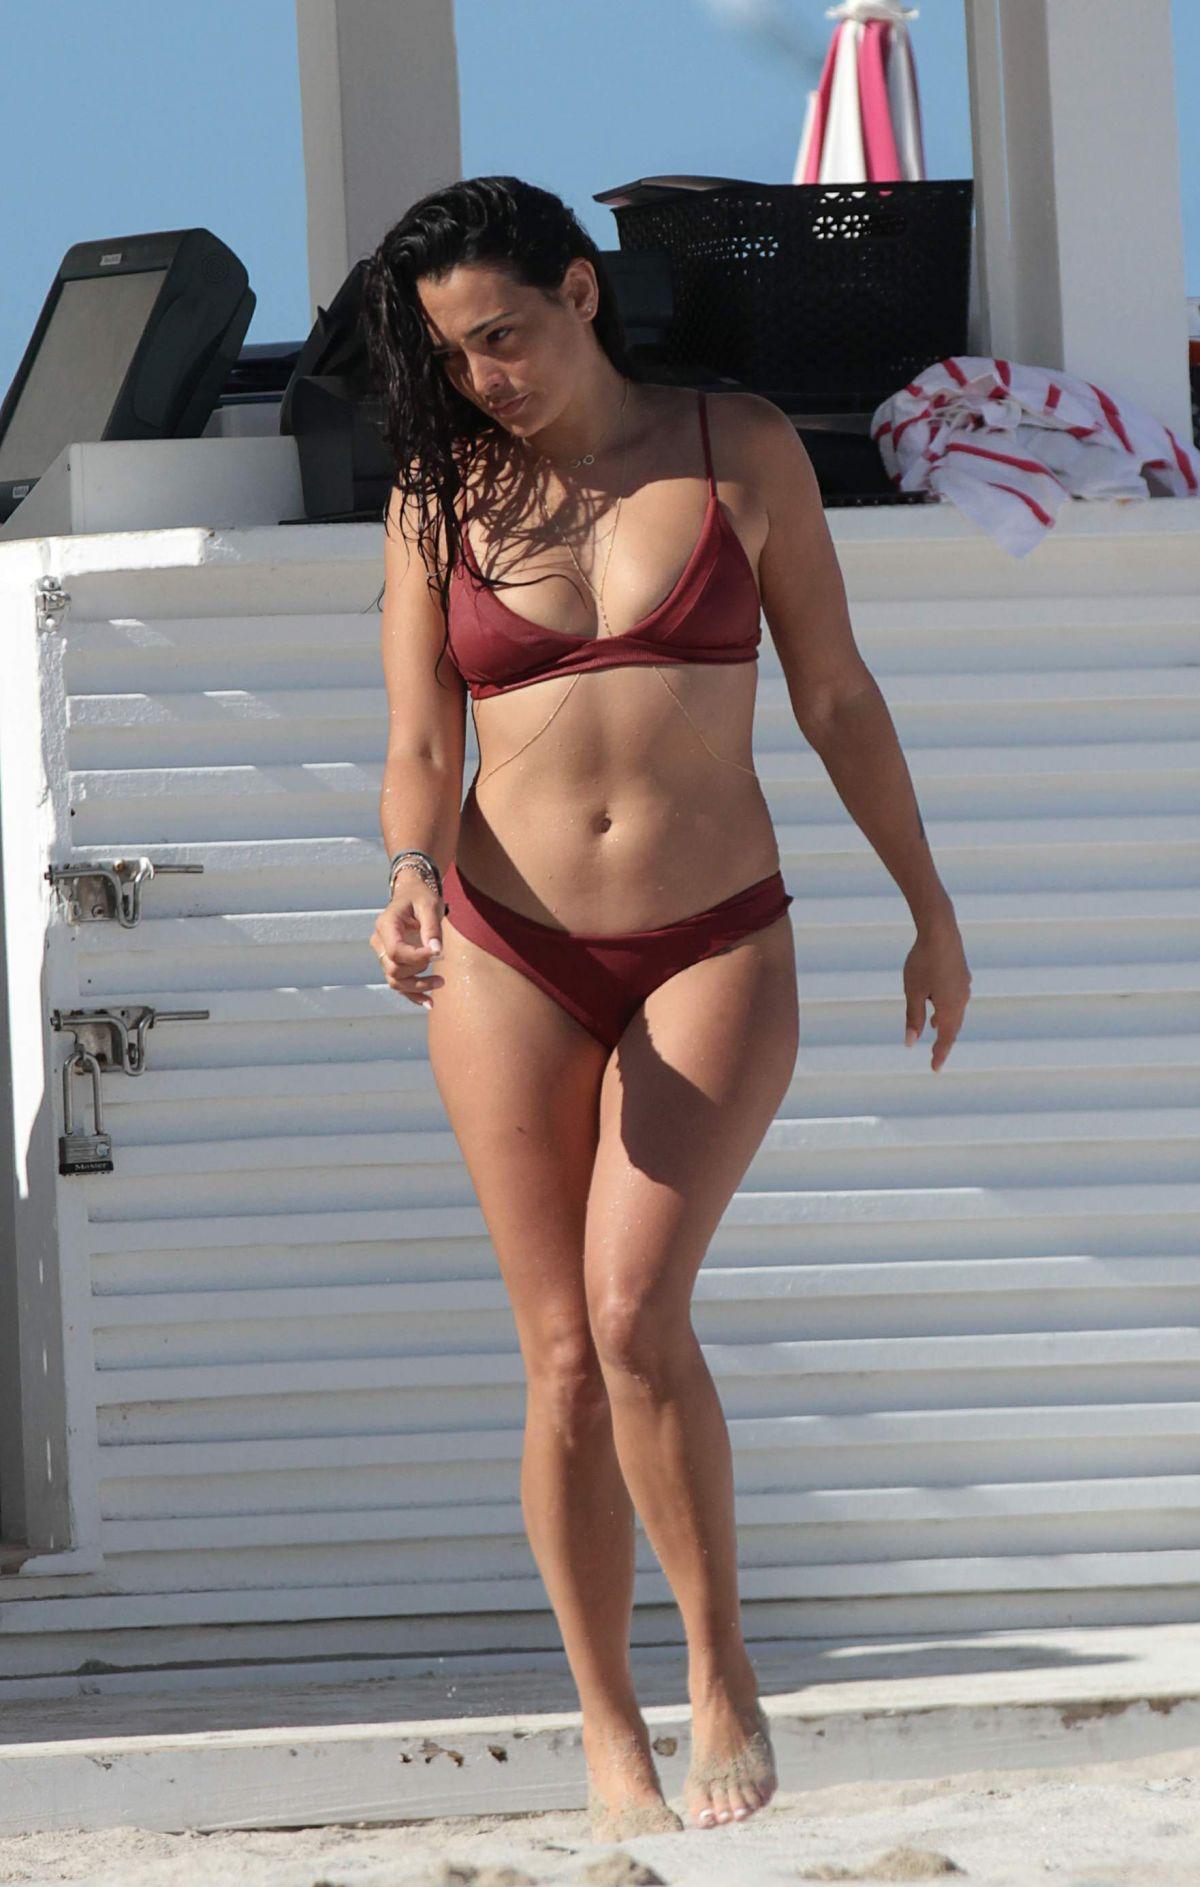 Model natalie martinez nude photos shoulders